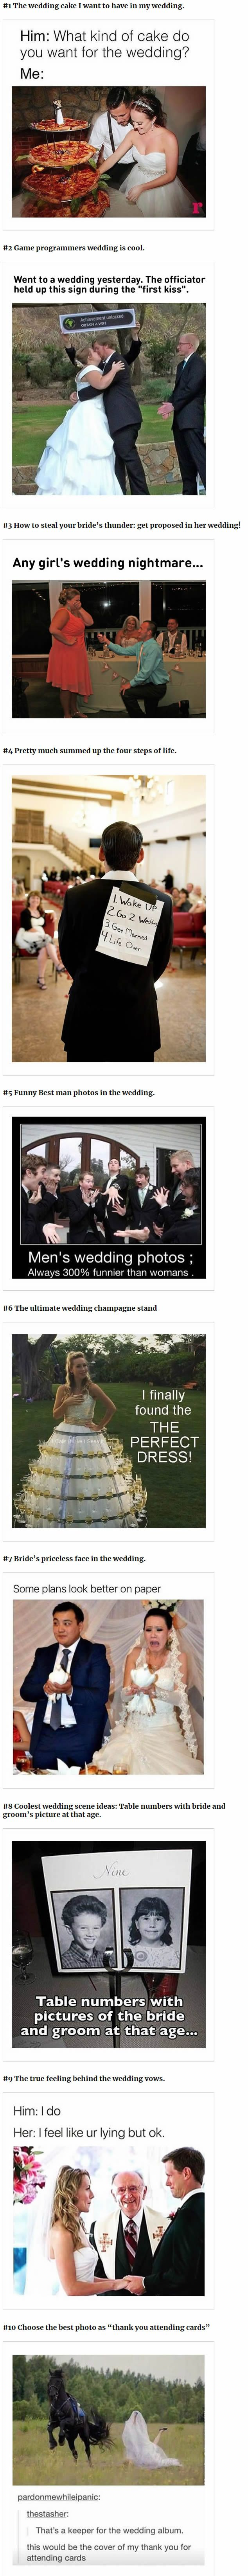 Wedding Memes Coolest Wedding Scene Ideas Funny Pinterest Funny Hilarious And Lol